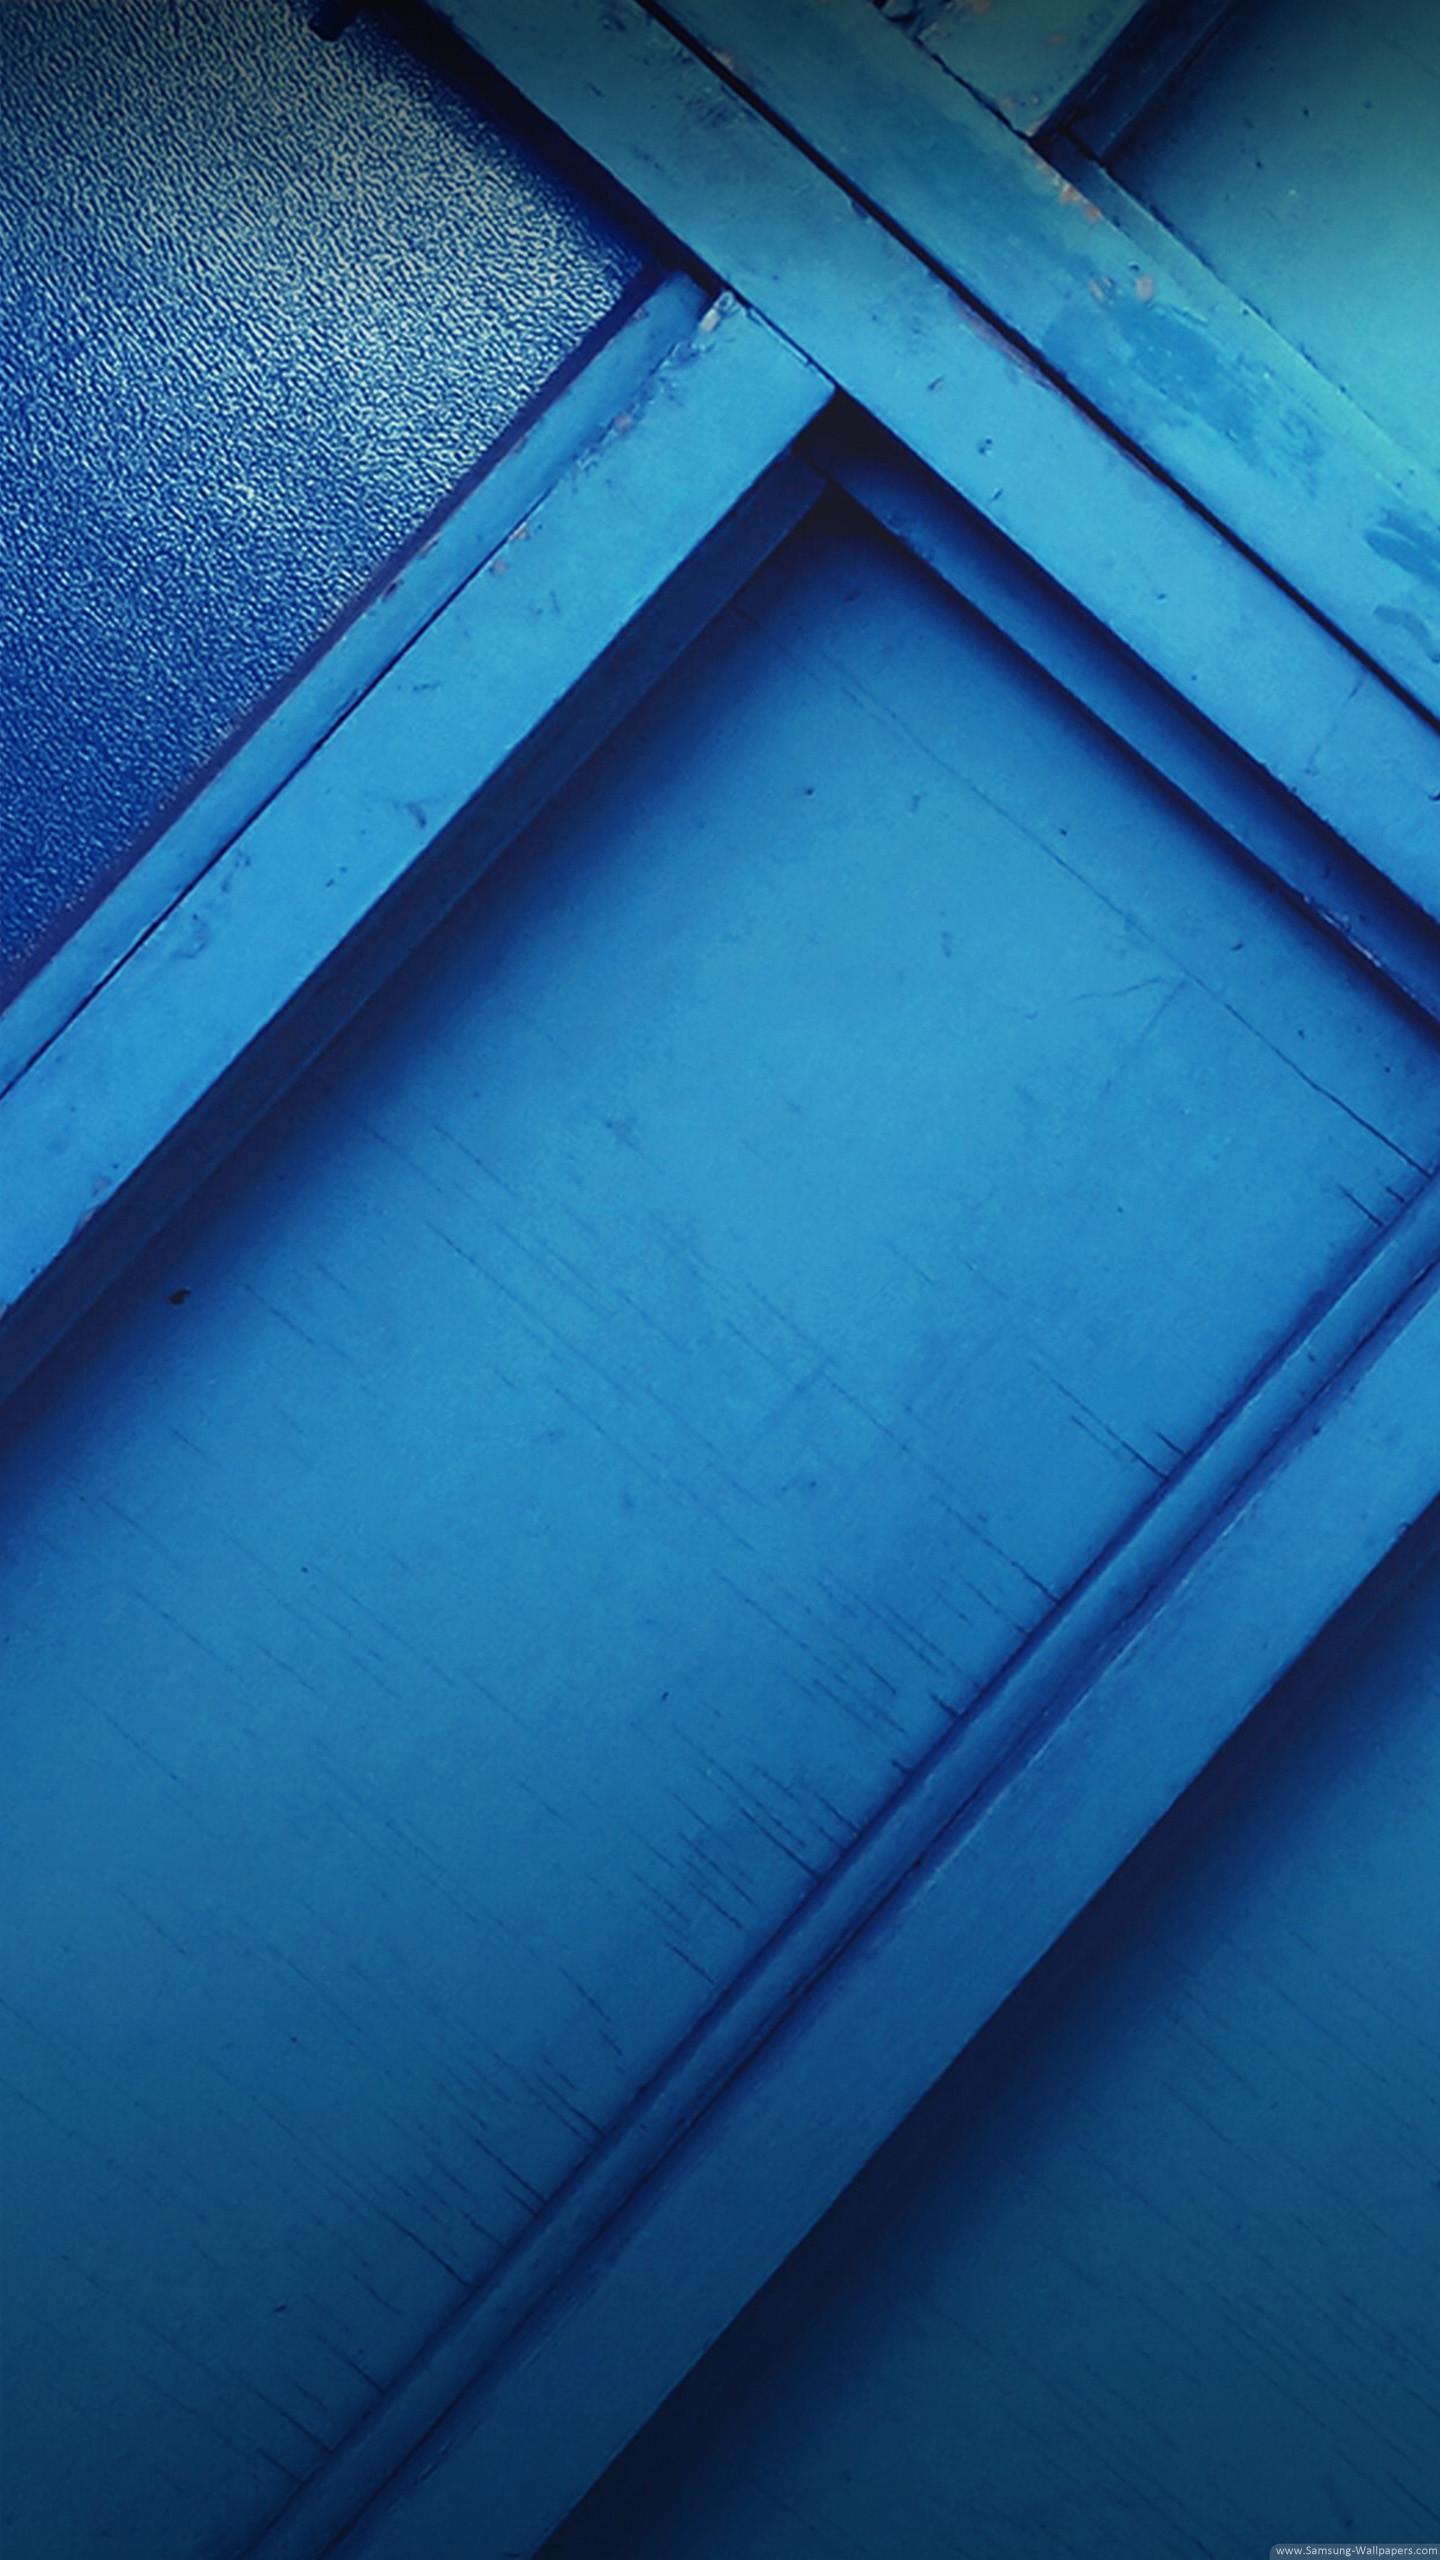 Samsung Galaxy Note 5 Wallpapers Wallpapertag